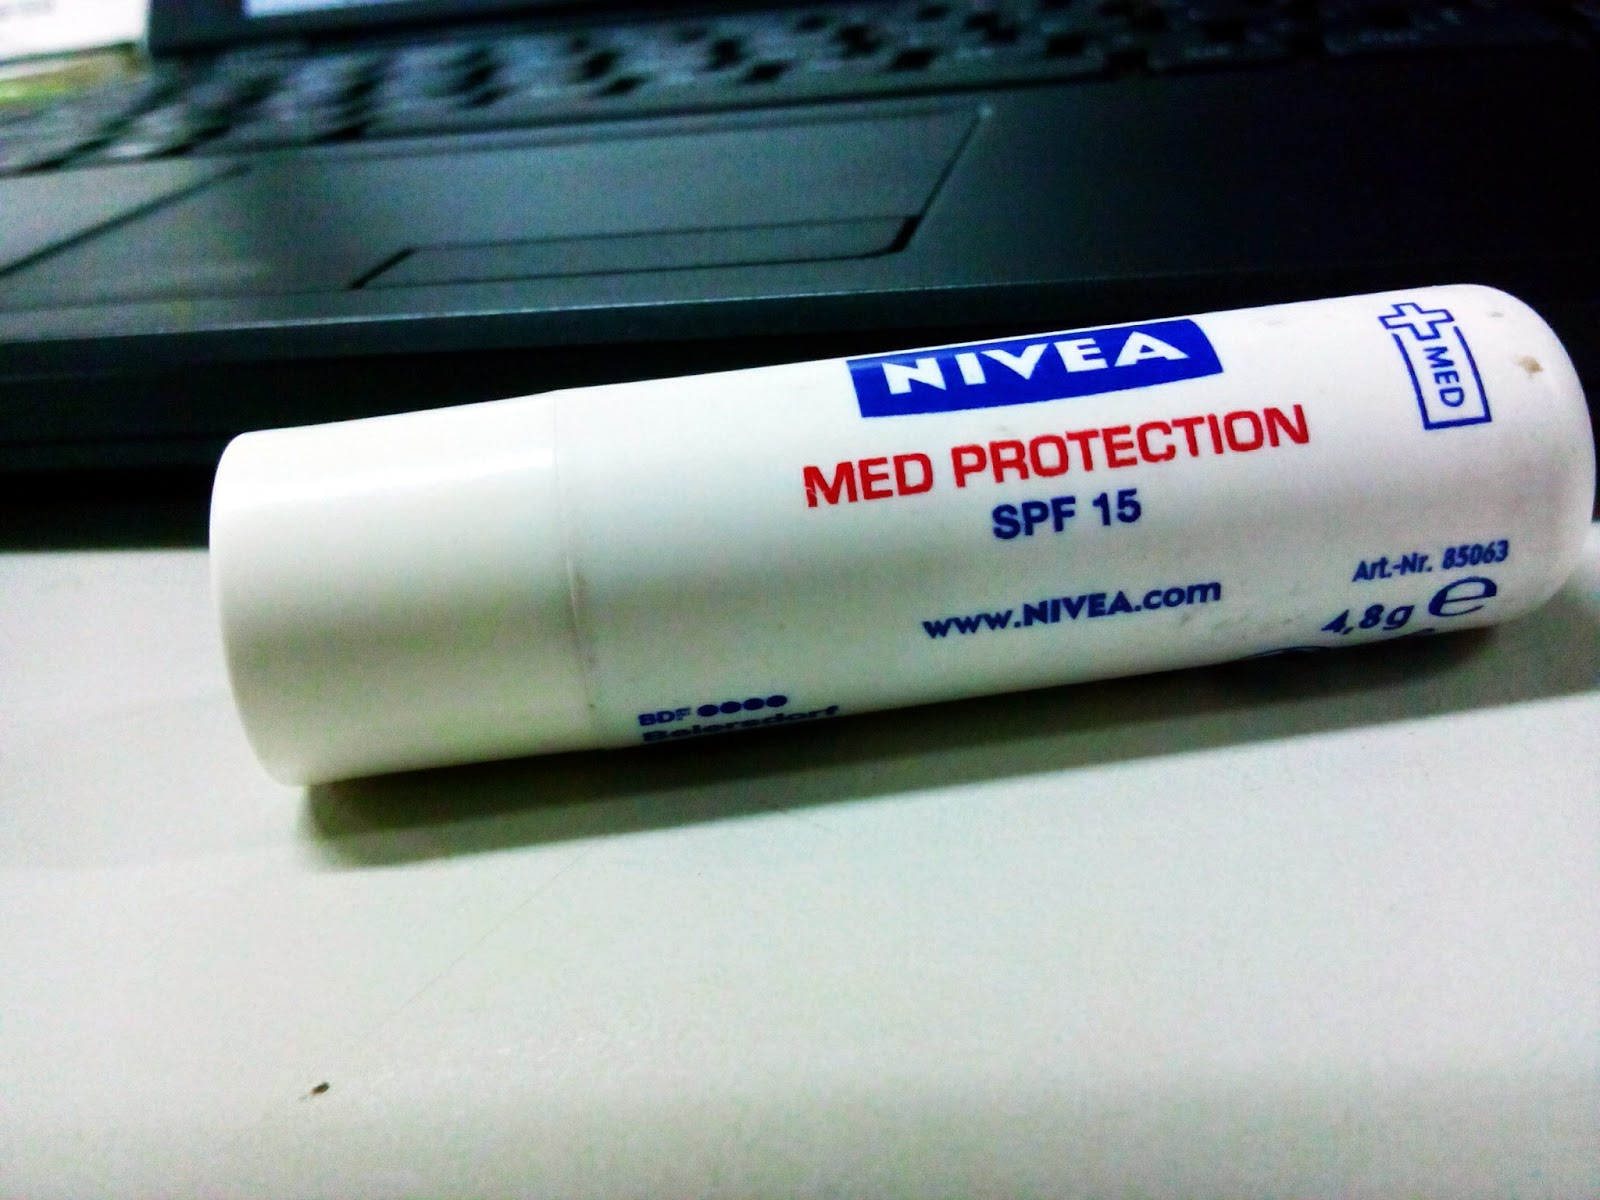 Lipbalm Nivea Med Protection 15 SPF